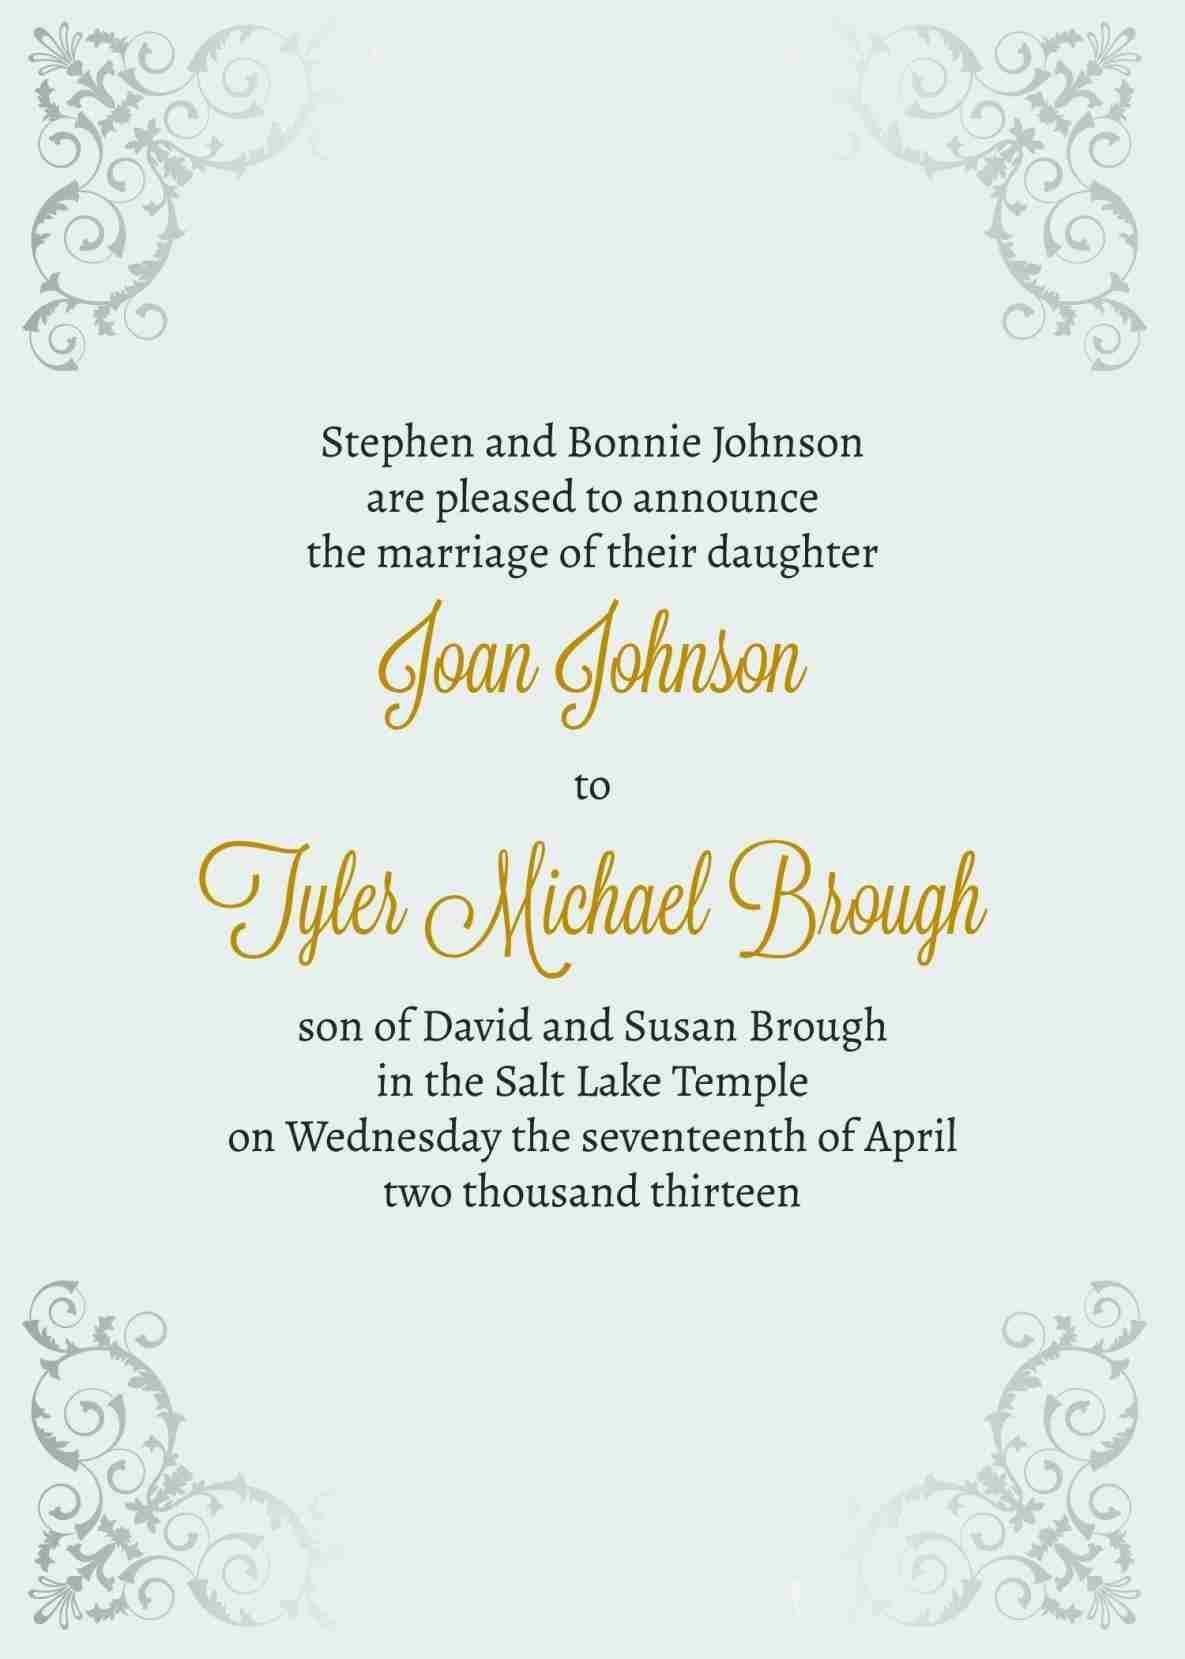 marriage invitations